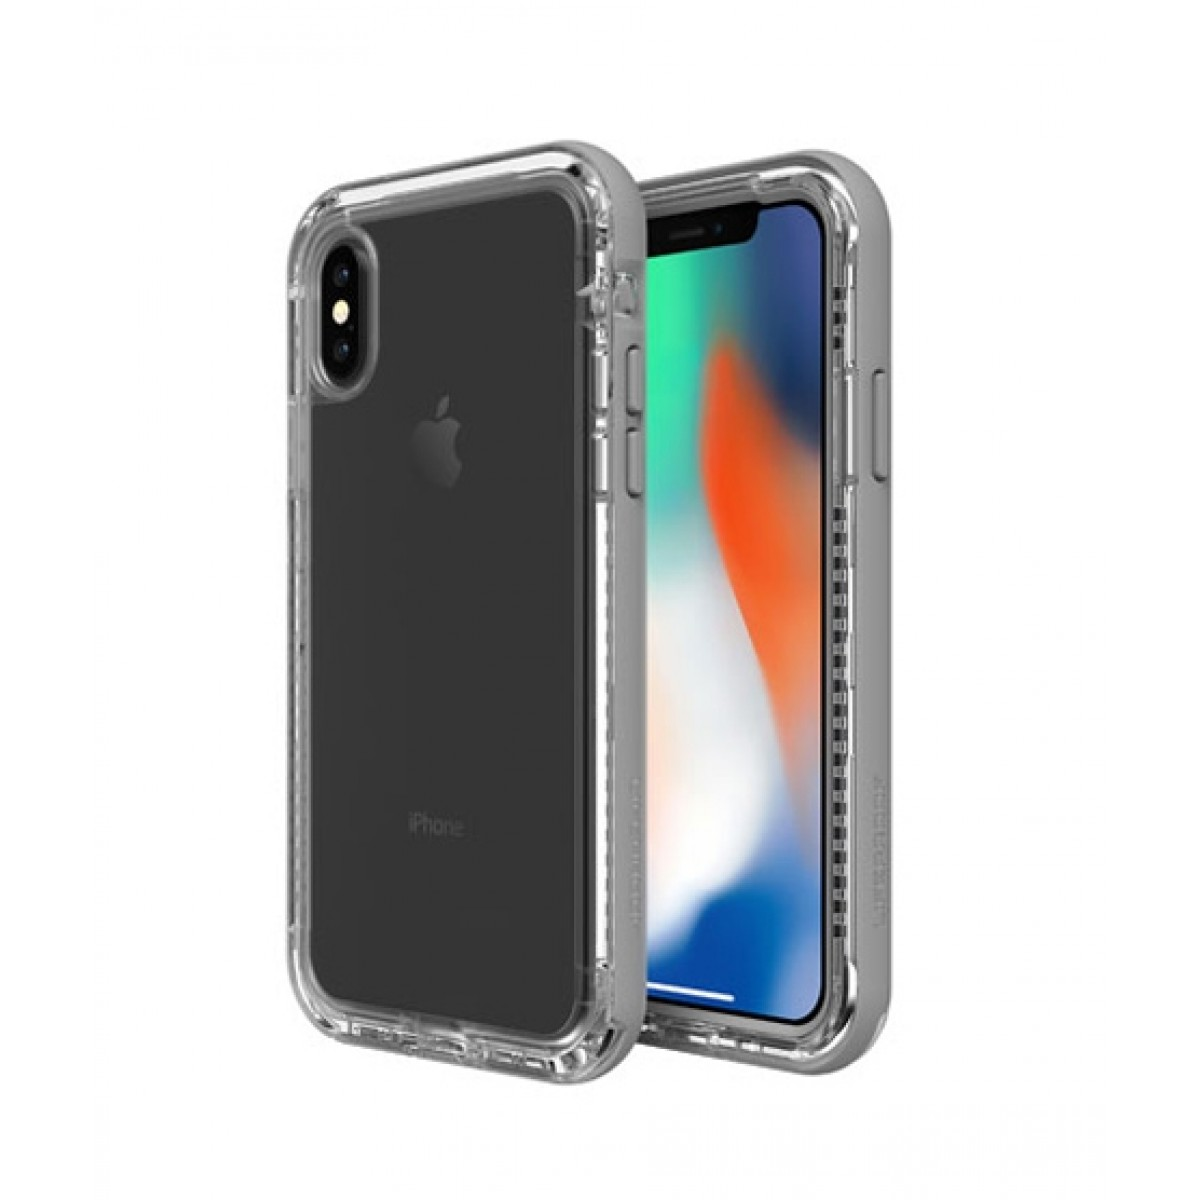 official photos e82ab e8100 Lifeproof NEXT Beach Pebble Case For iPhone X/XS